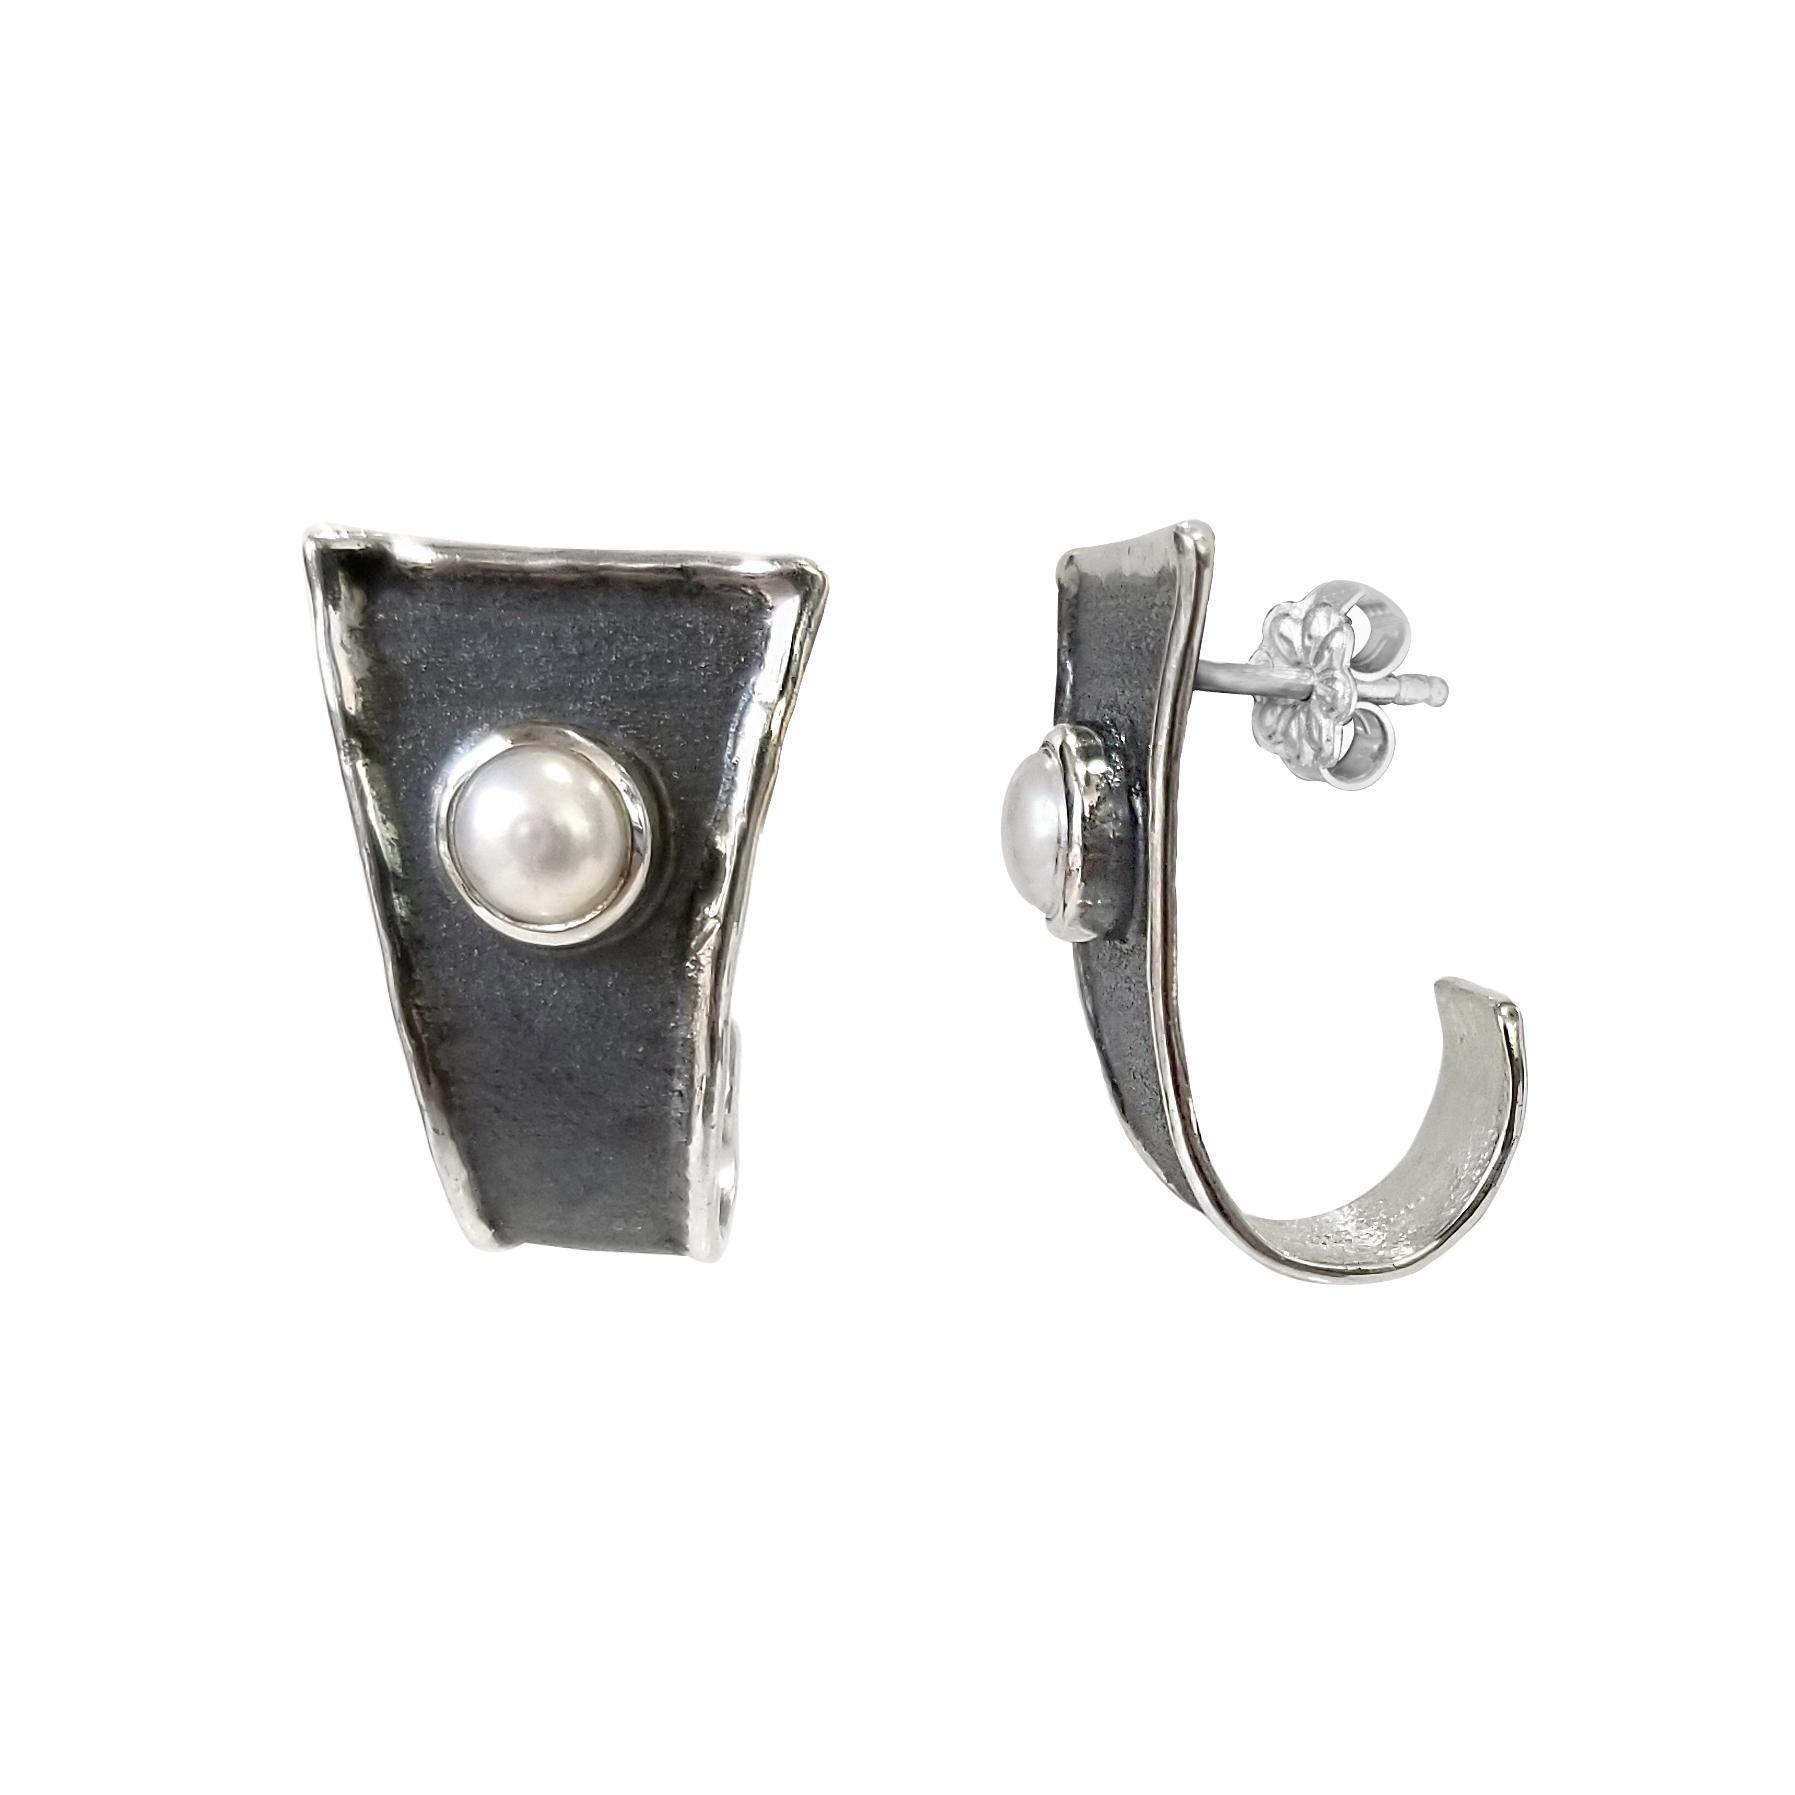 Yianni Creations Pearl Fine Silver and Black Rhodium Handmade Earrings